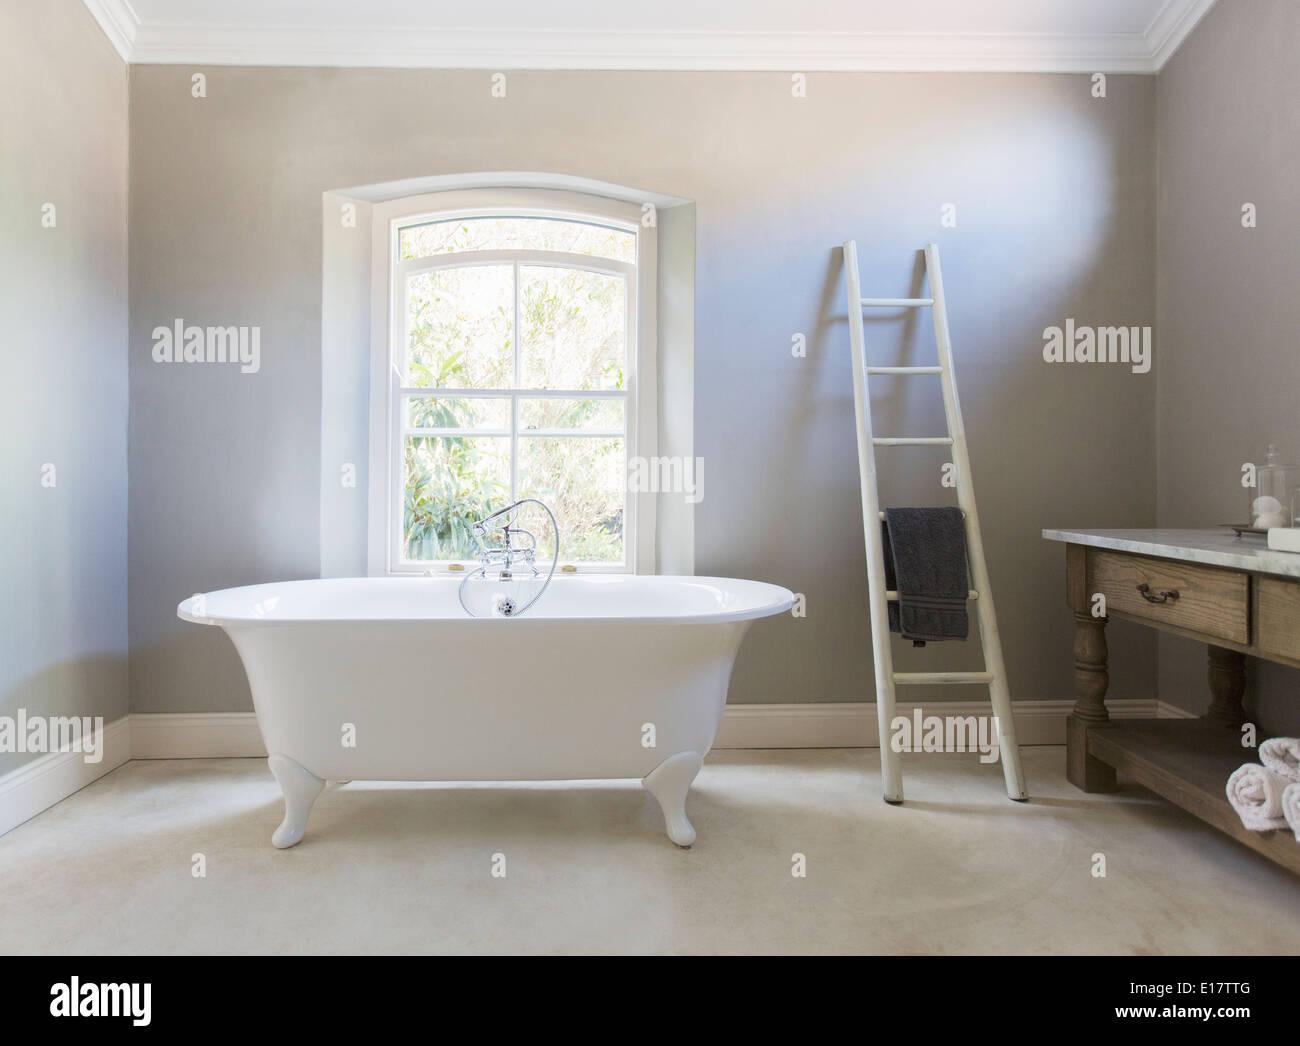 Claw foot tub in luxury bathroom - Stock Image